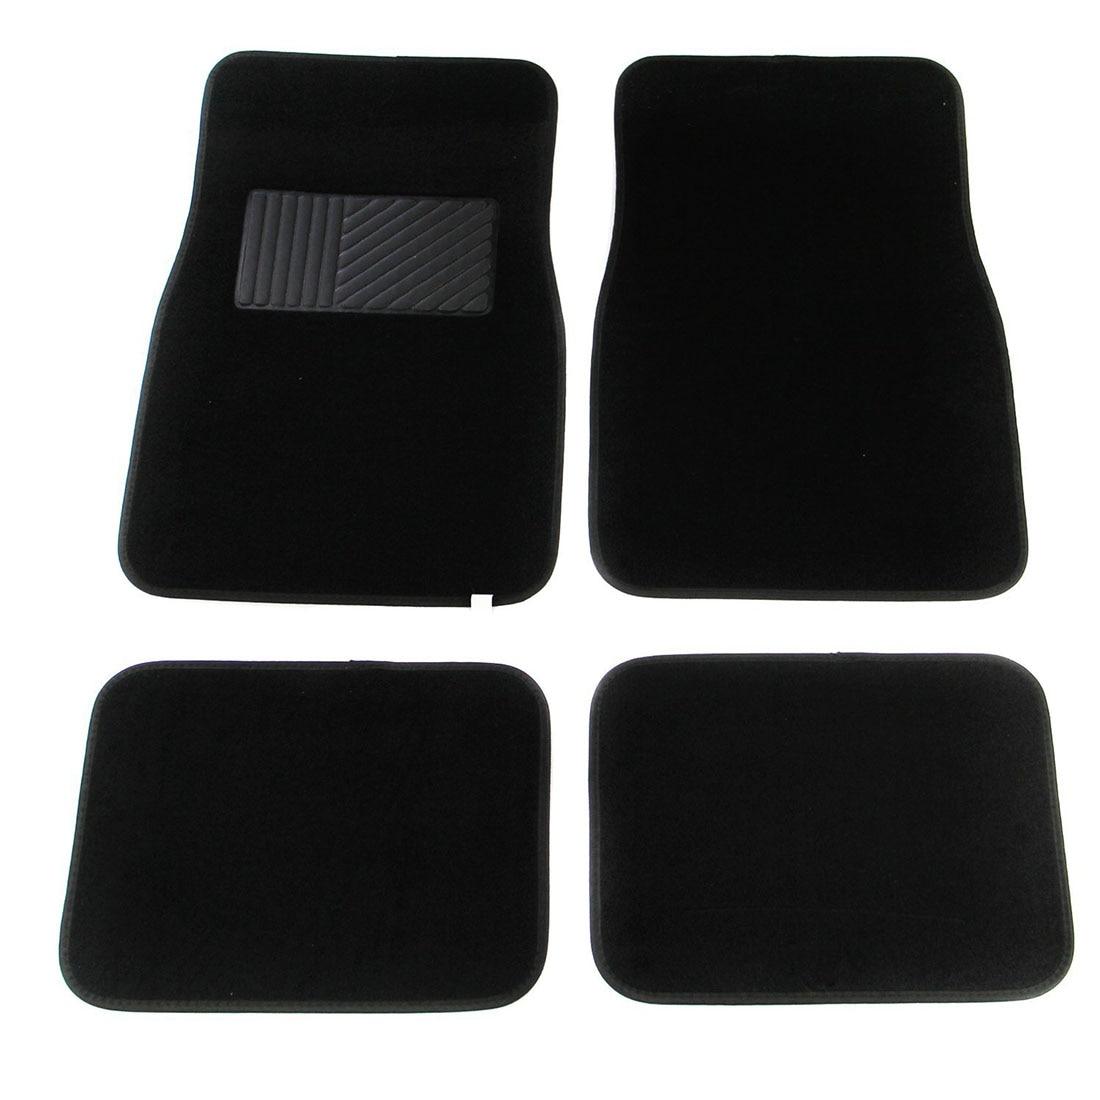 Multi Season Carpet Floor Mats 4pc Set Black Fit Most Cars, SUVs, Vans and Trucks